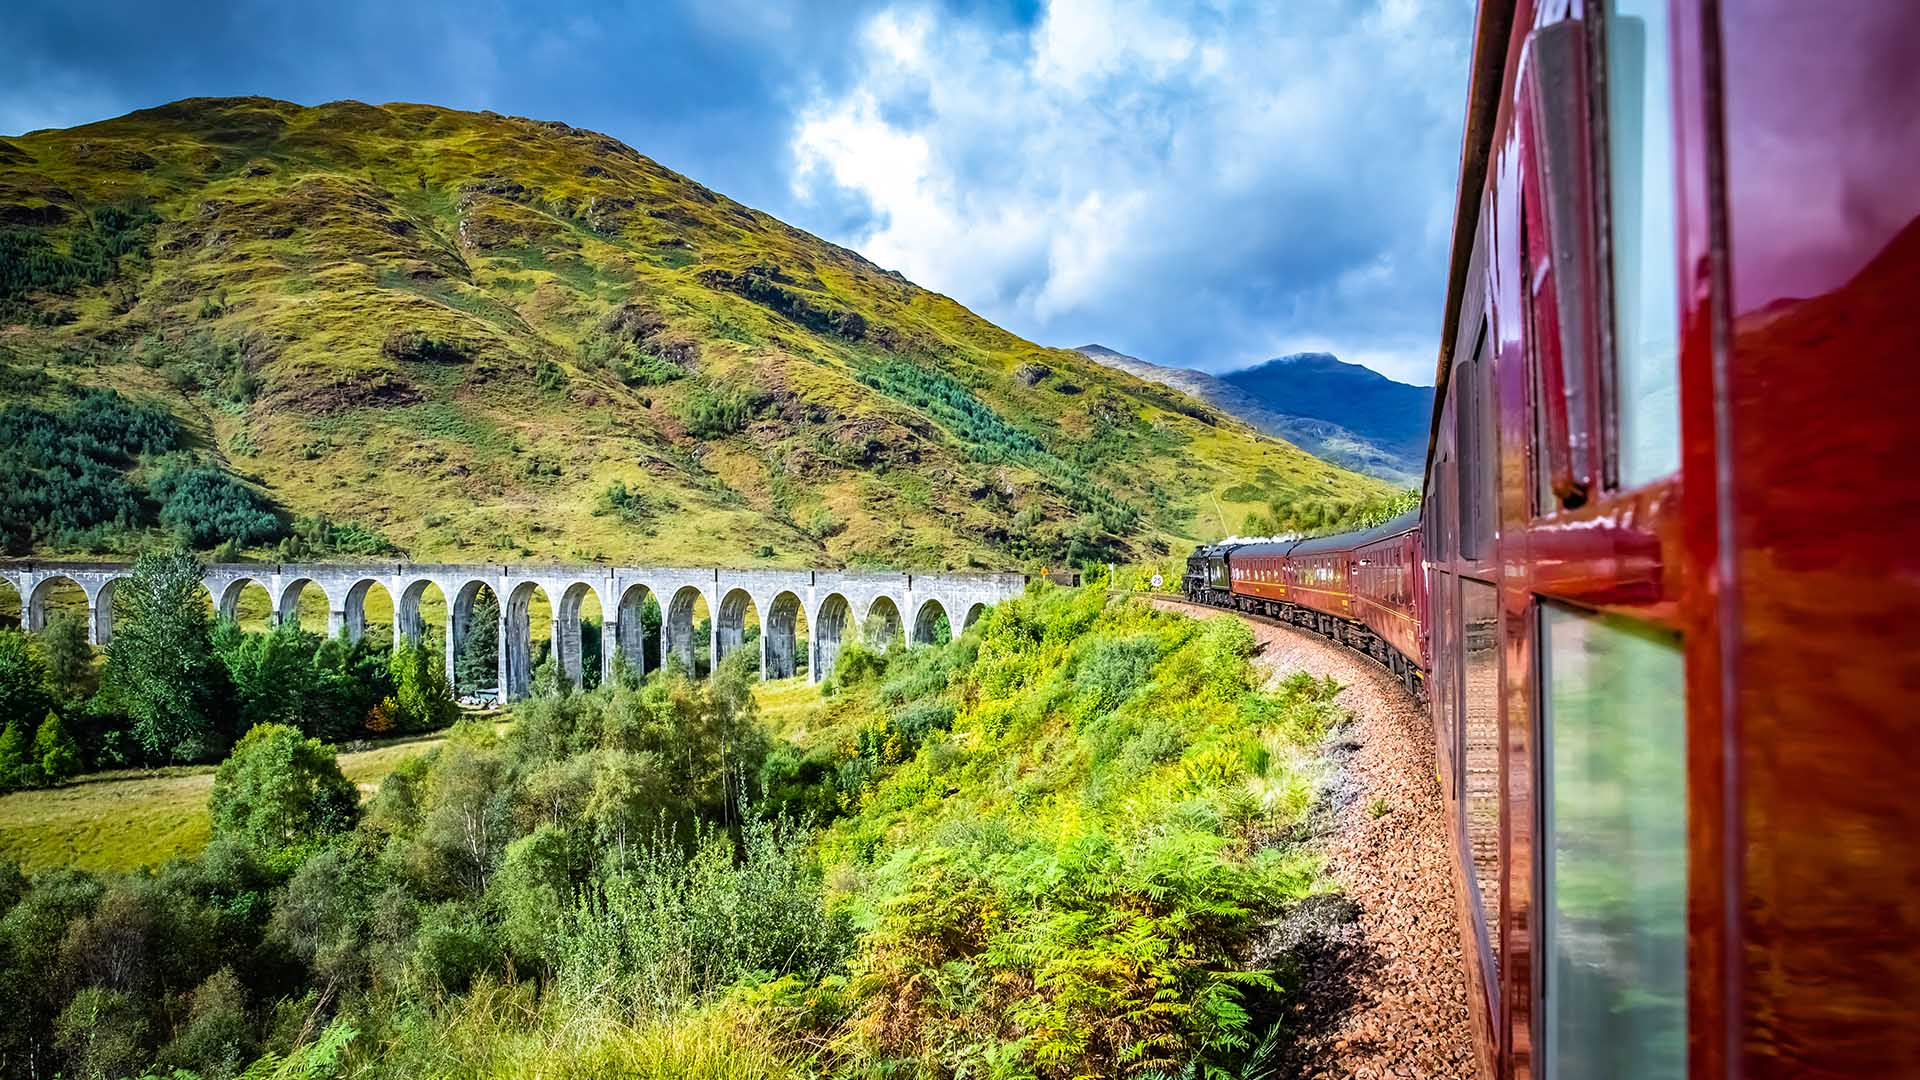 guided-rail-train-tours-expat-explore-train-europe-scotland